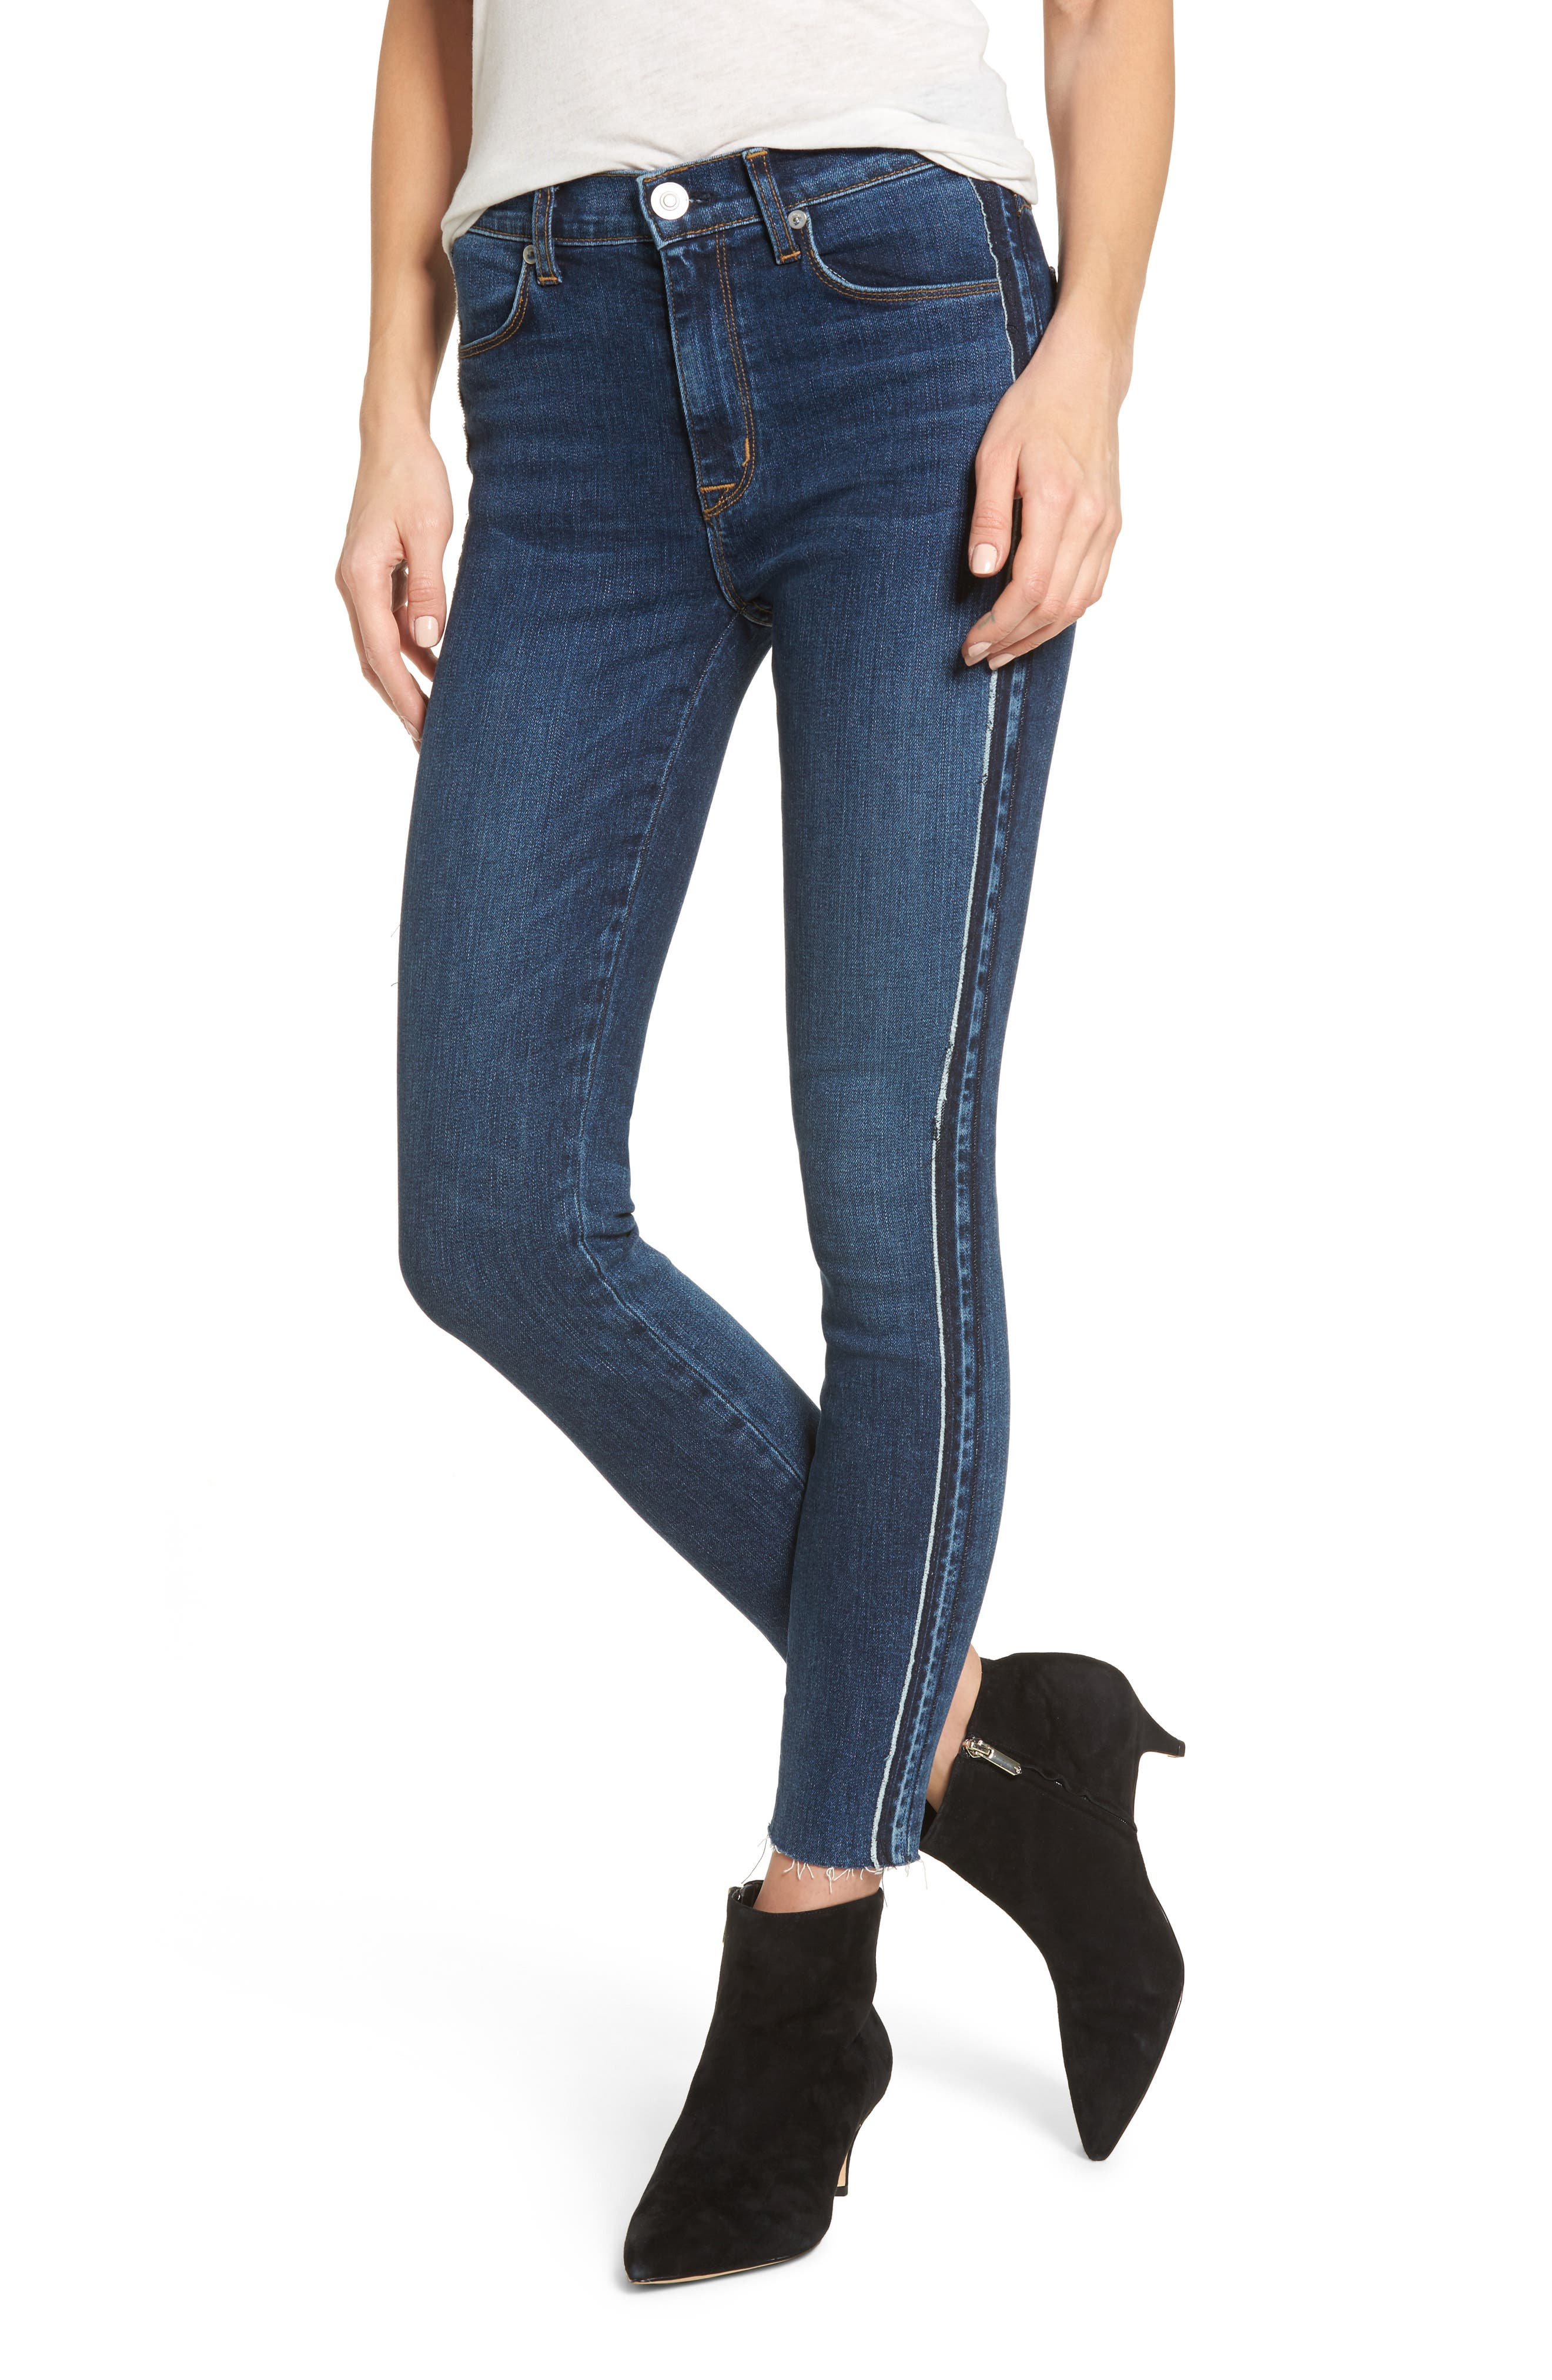 Alternate Image 1 Selected - Hudson Jeans Barbara High Waist Super Skinny Jeans (Fatal)